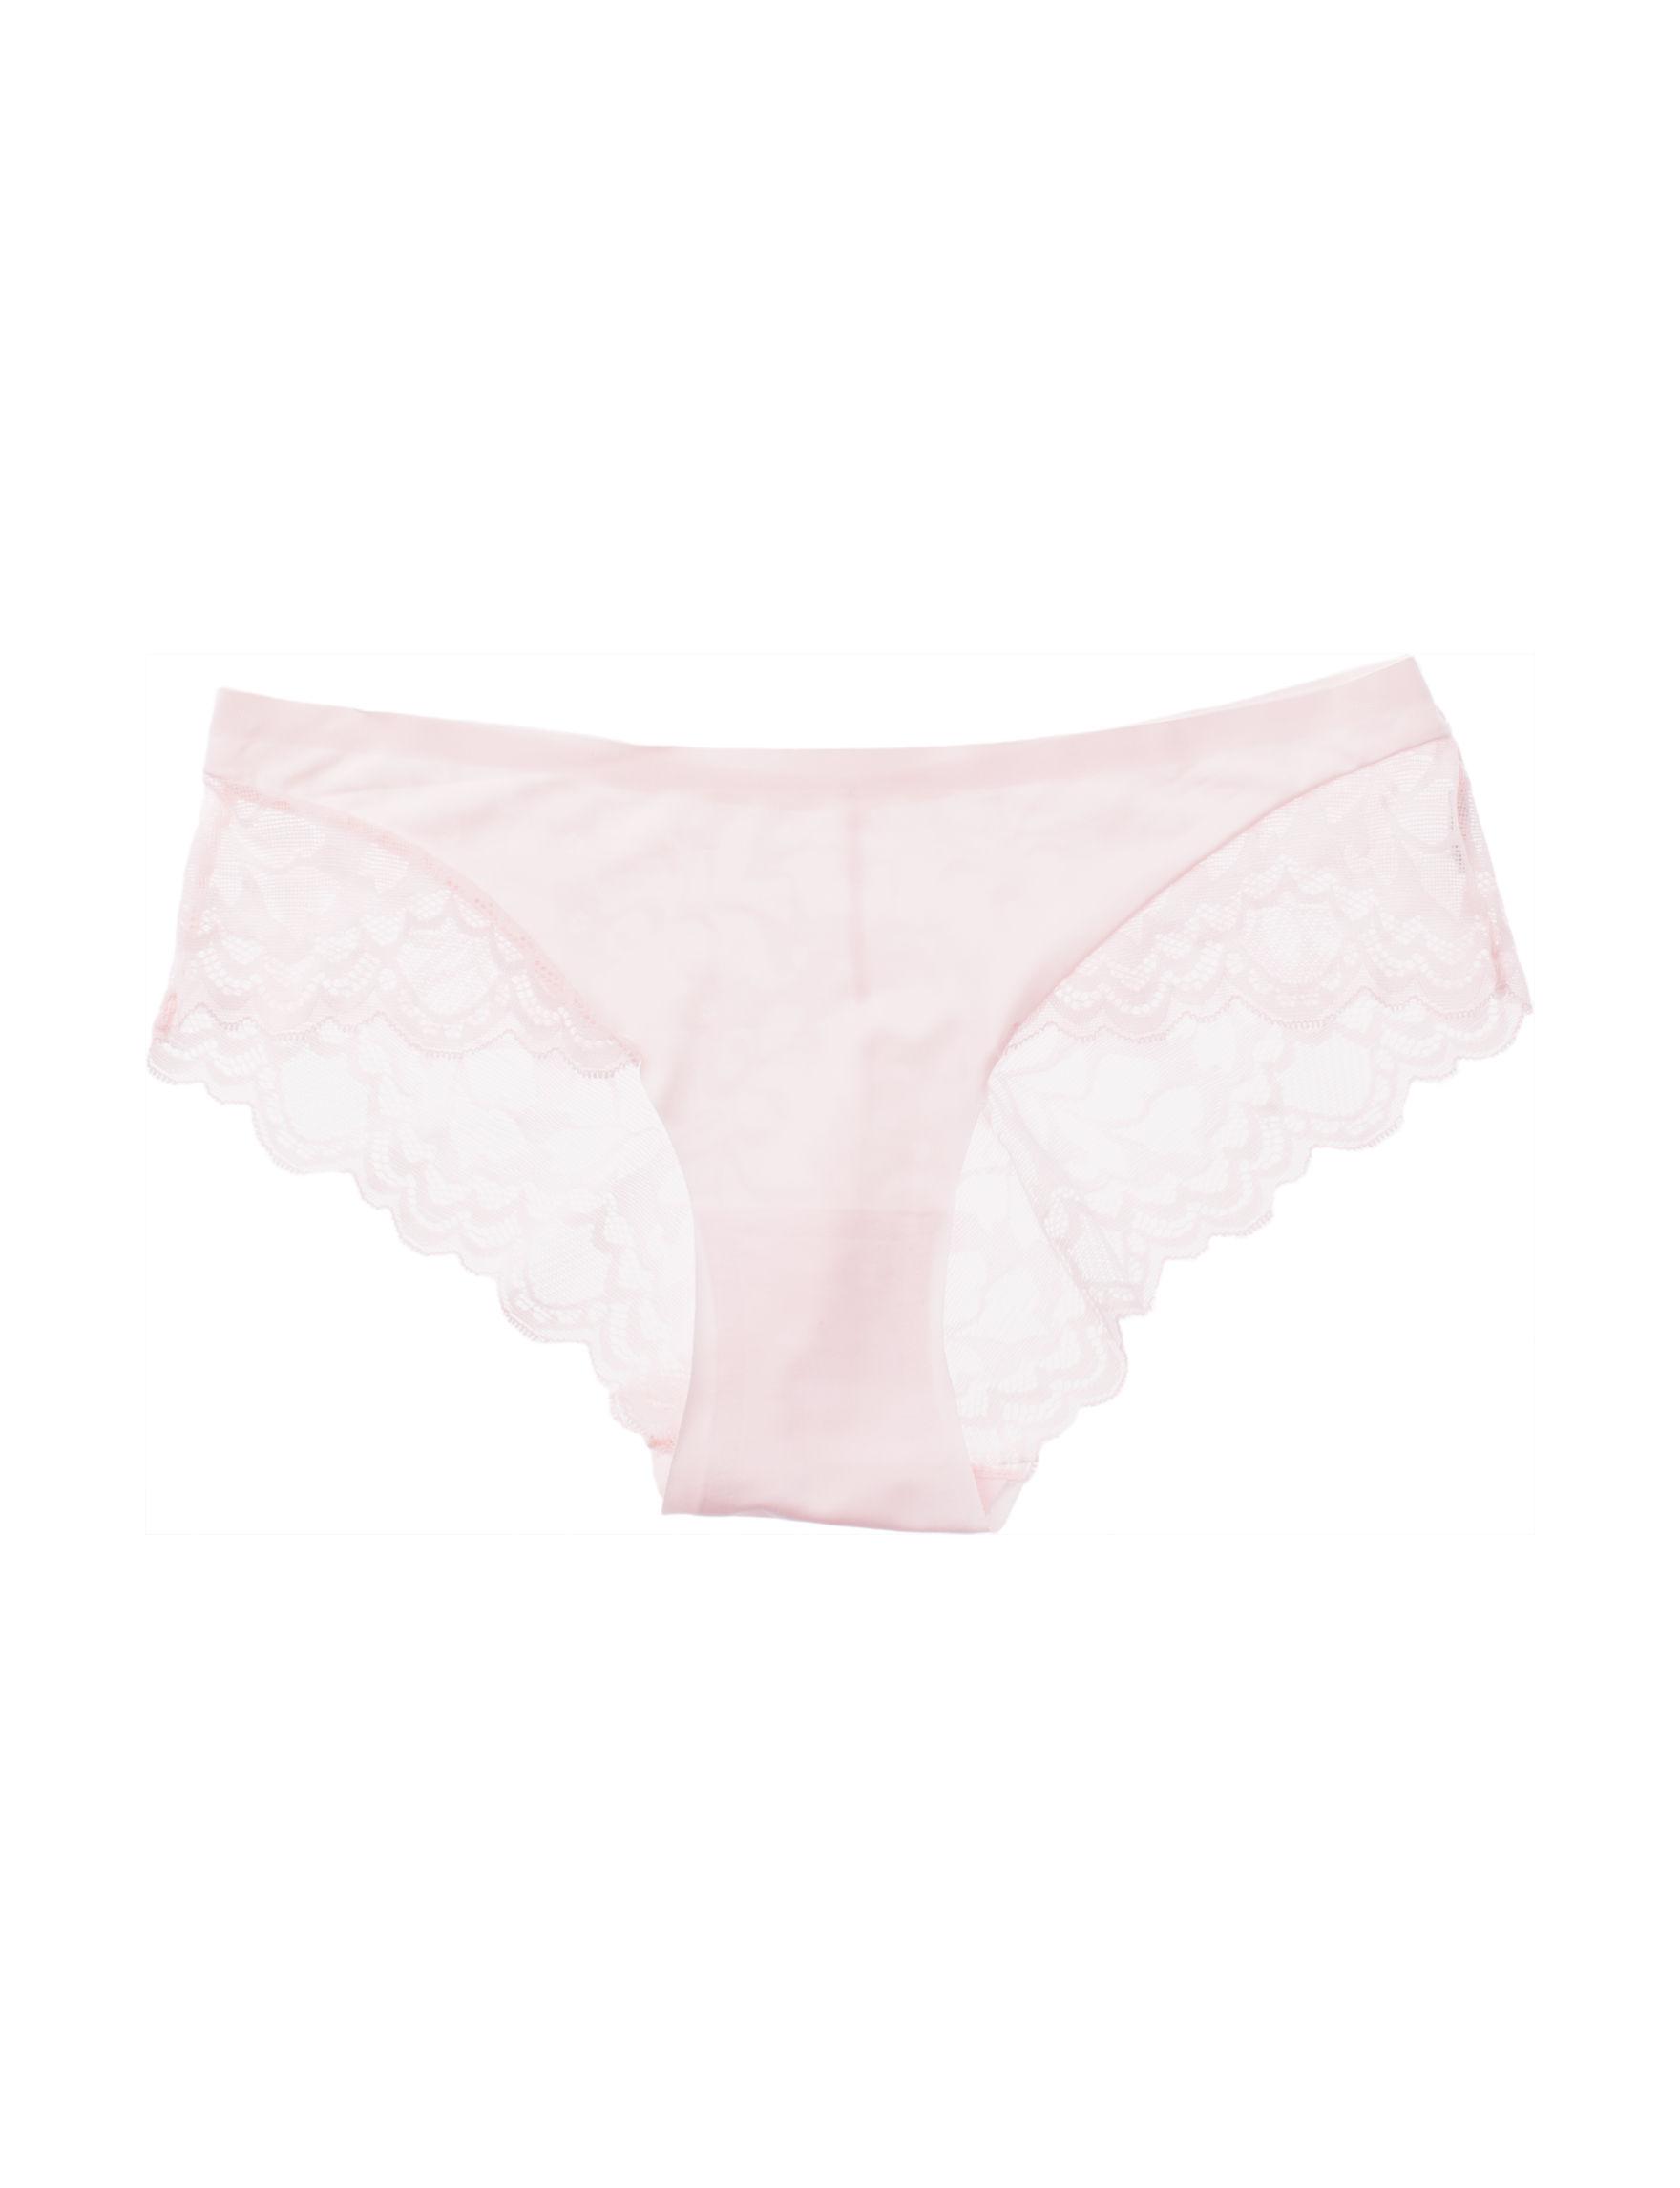 Rene Rofe Pink Panties Hipster